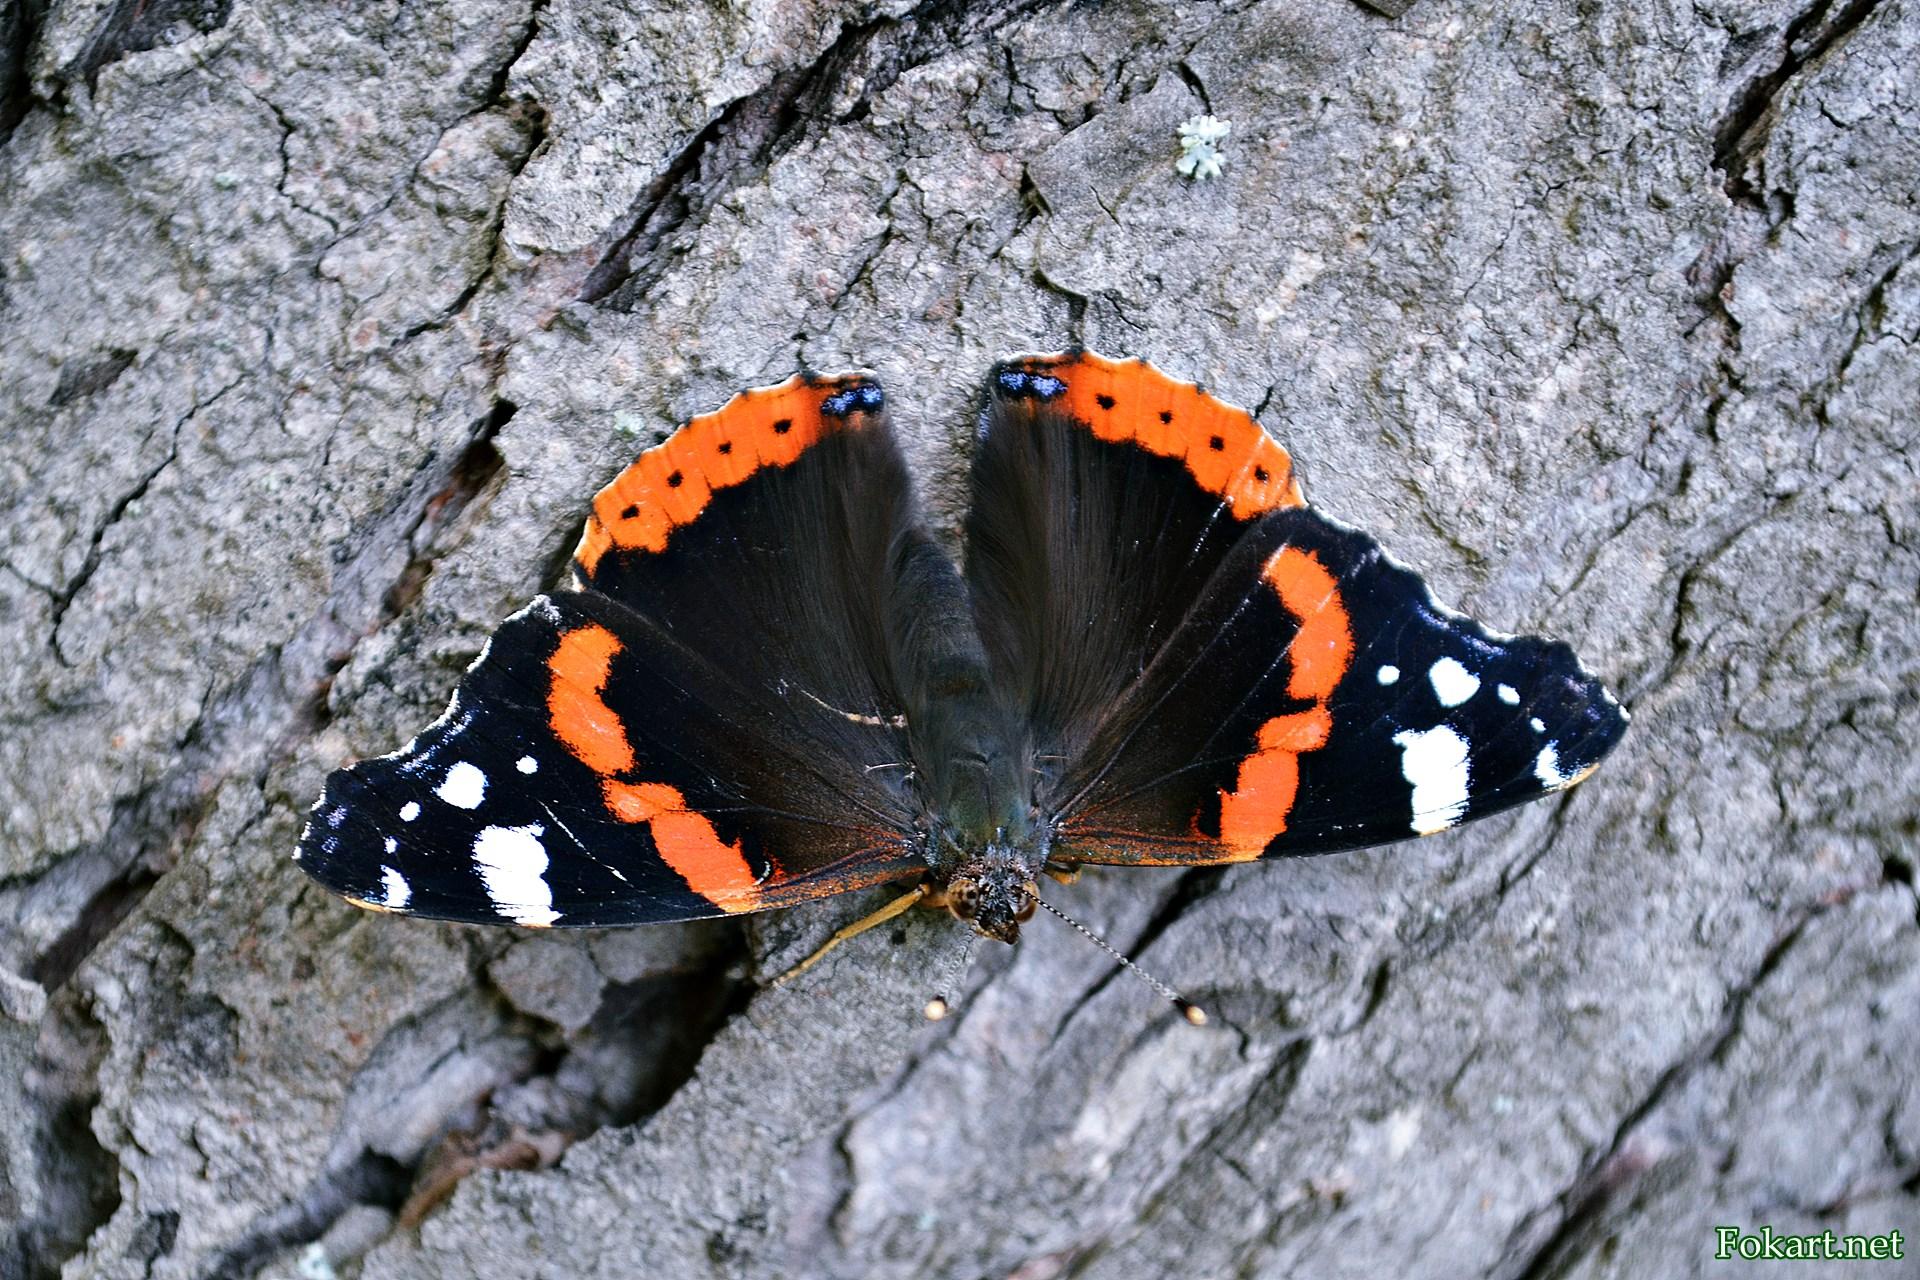 Бабочка Адмирал на стволе дерева